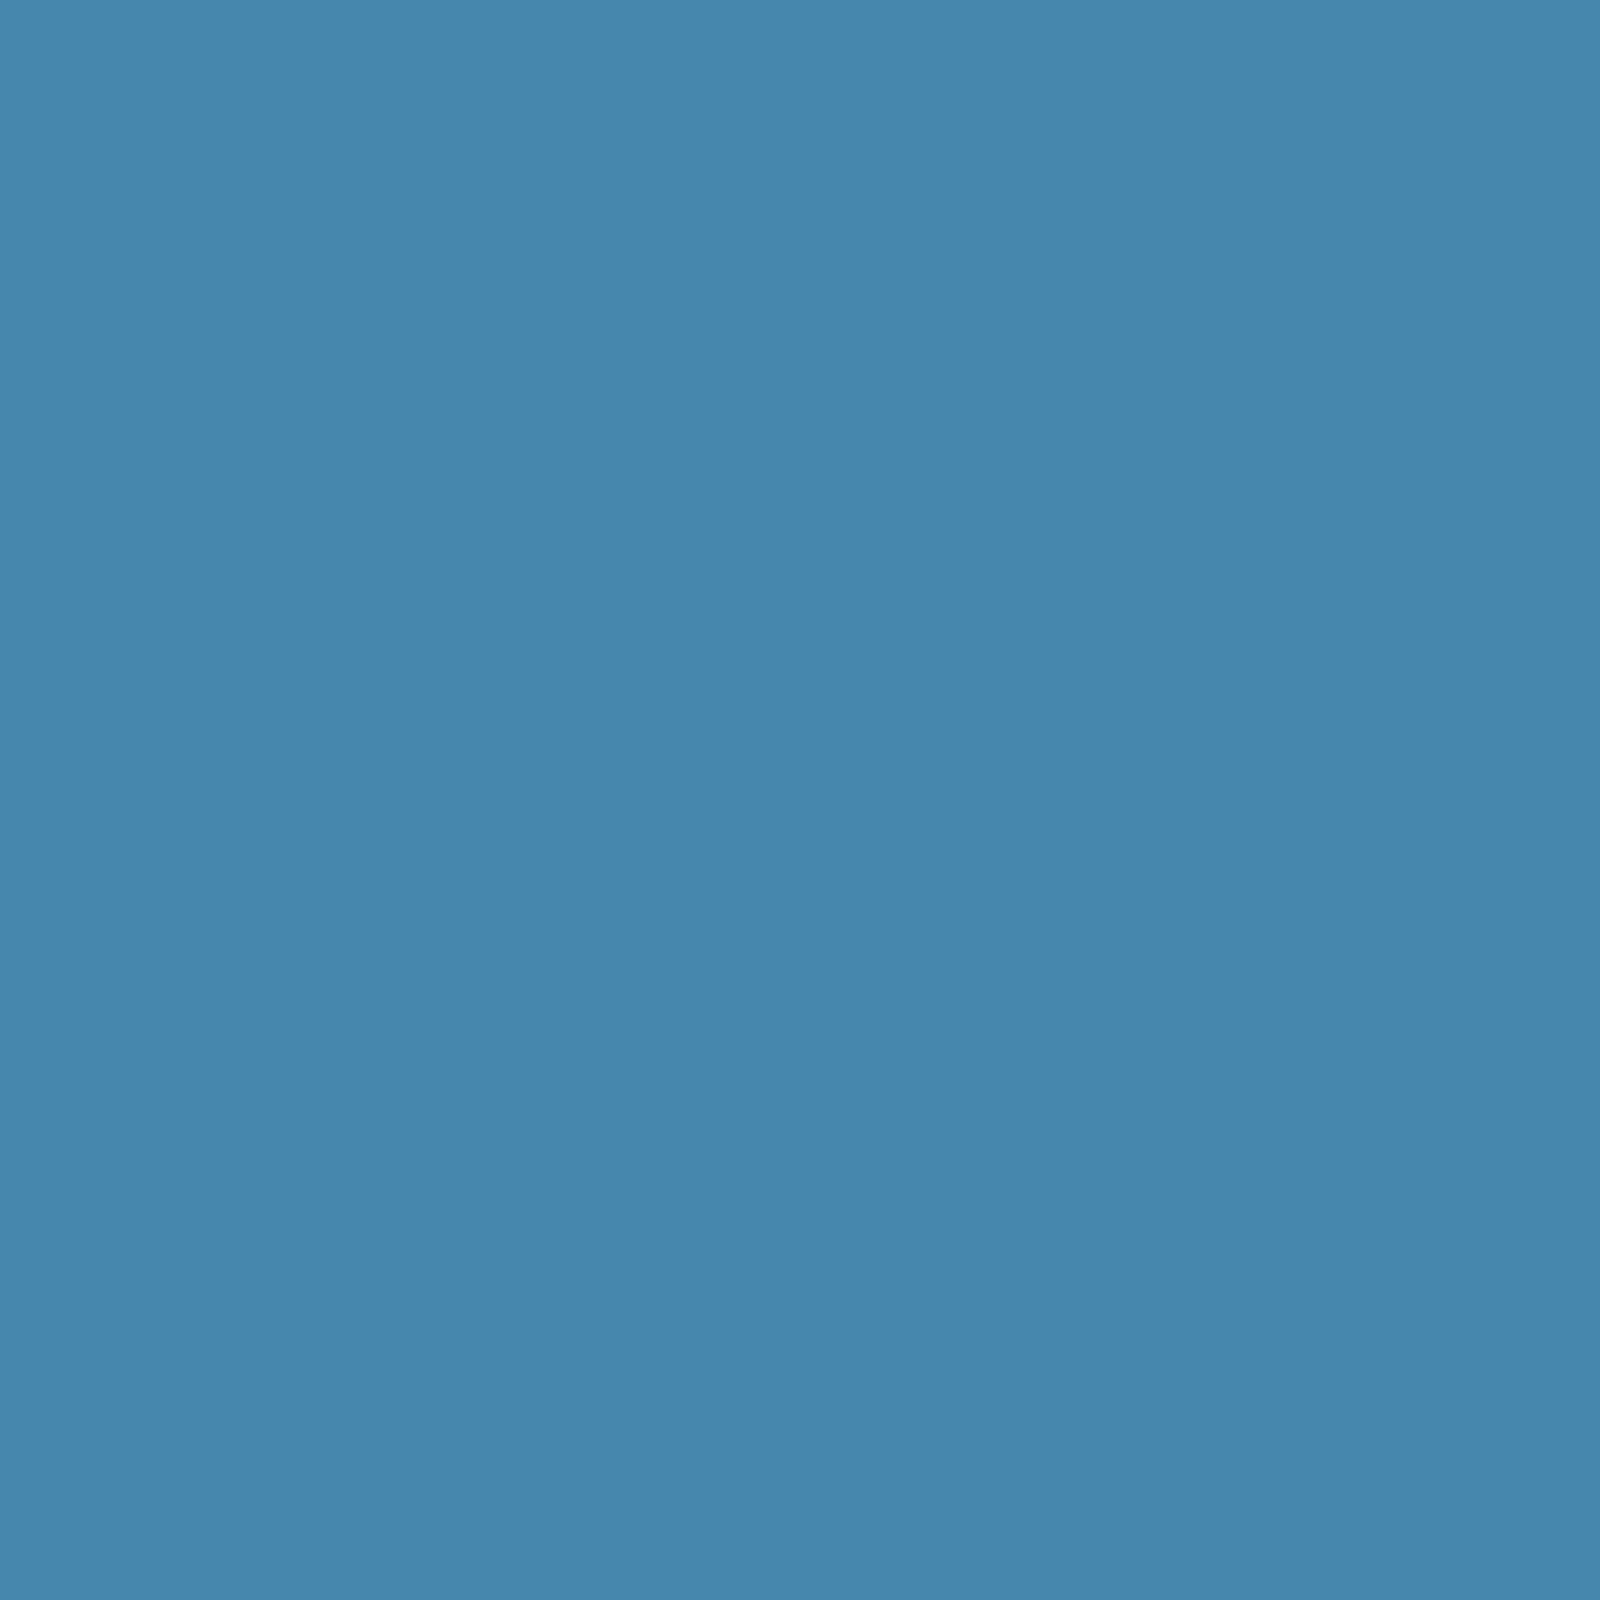 consolan profi wetterschutzfarbe 10 l farbauswahl wetterschutz holzfarbe deck ebay. Black Bedroom Furniture Sets. Home Design Ideas